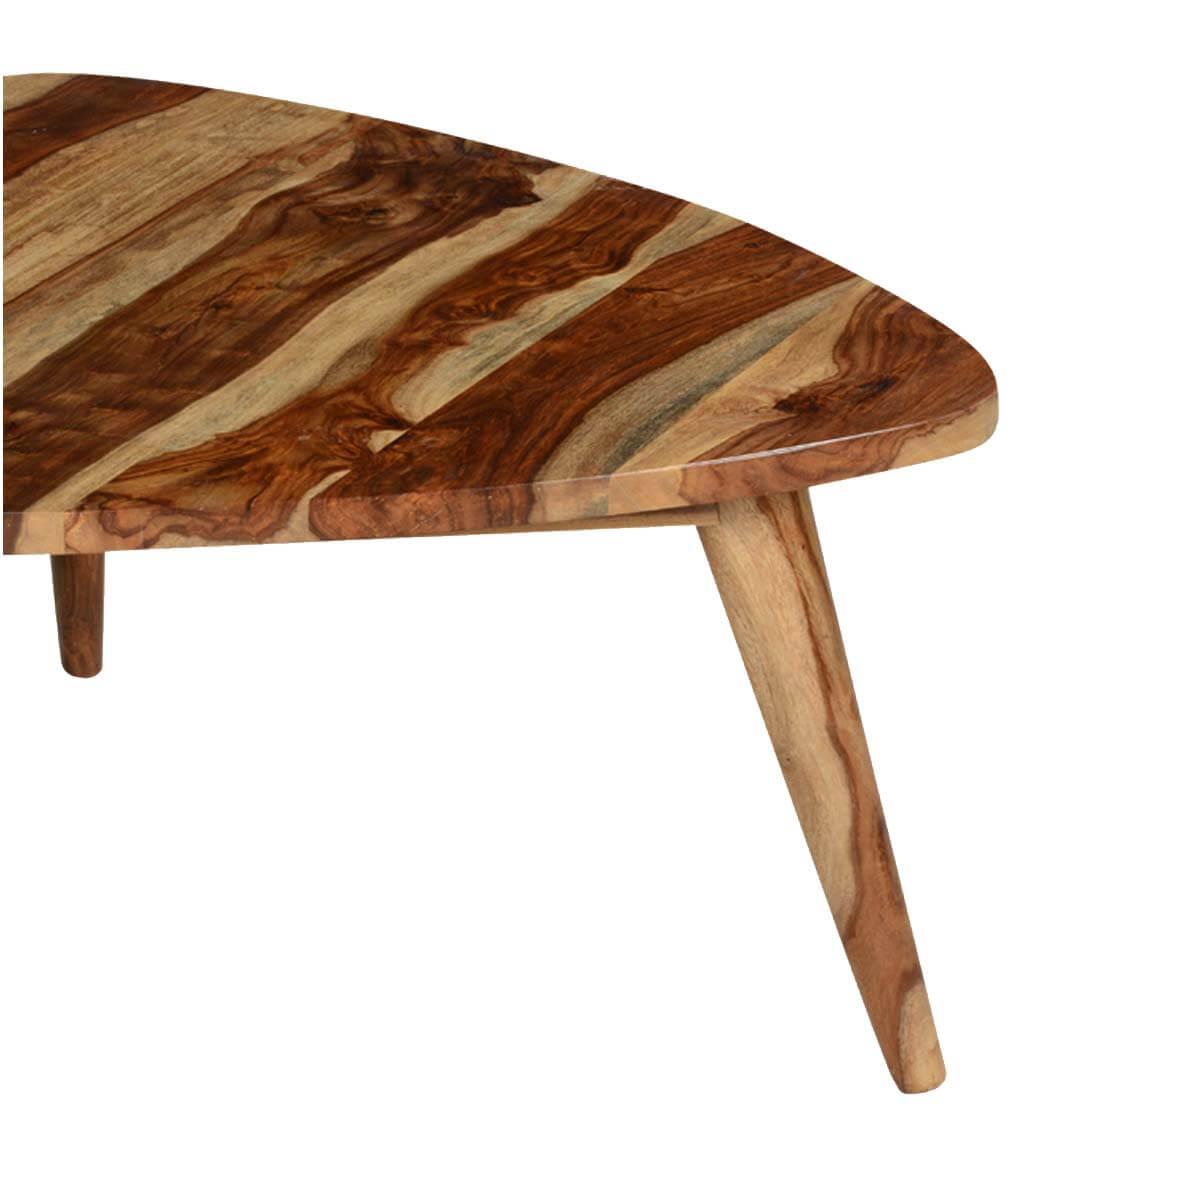 39 triangular solid wood coffee table 39 triangular solid indian rosewood coffee table geotapseo Choice Image